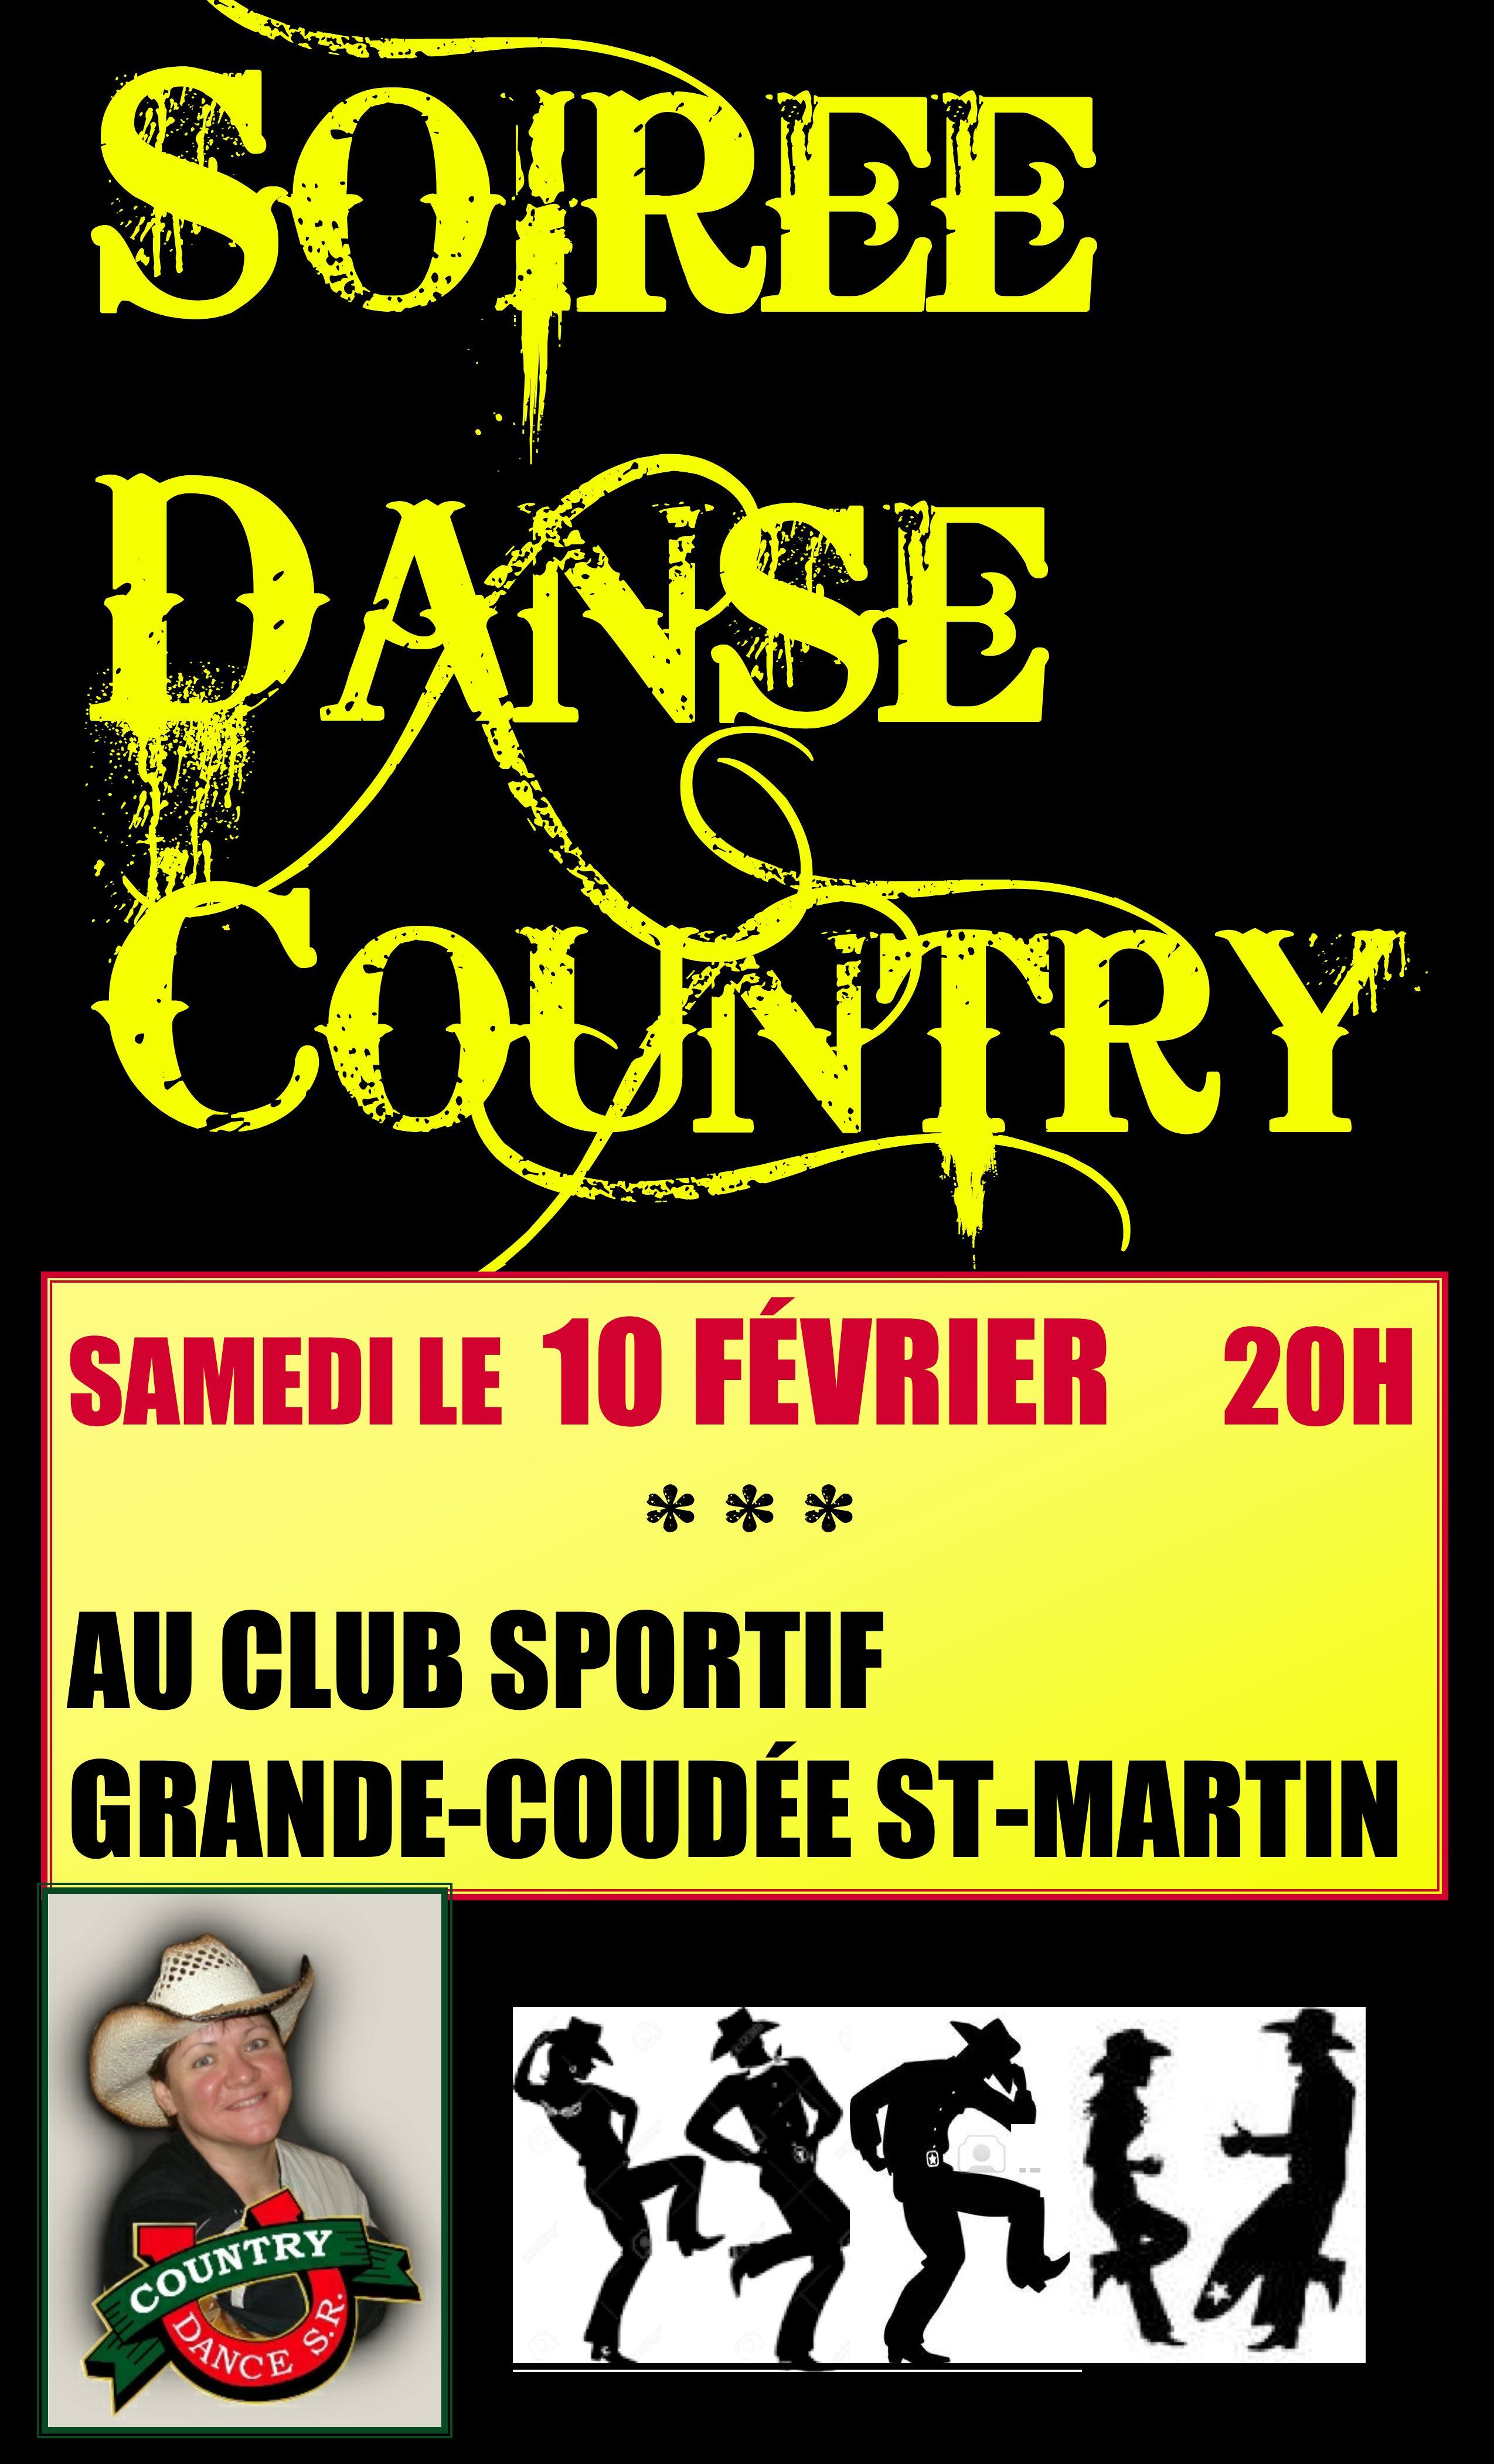 Soirée danse country